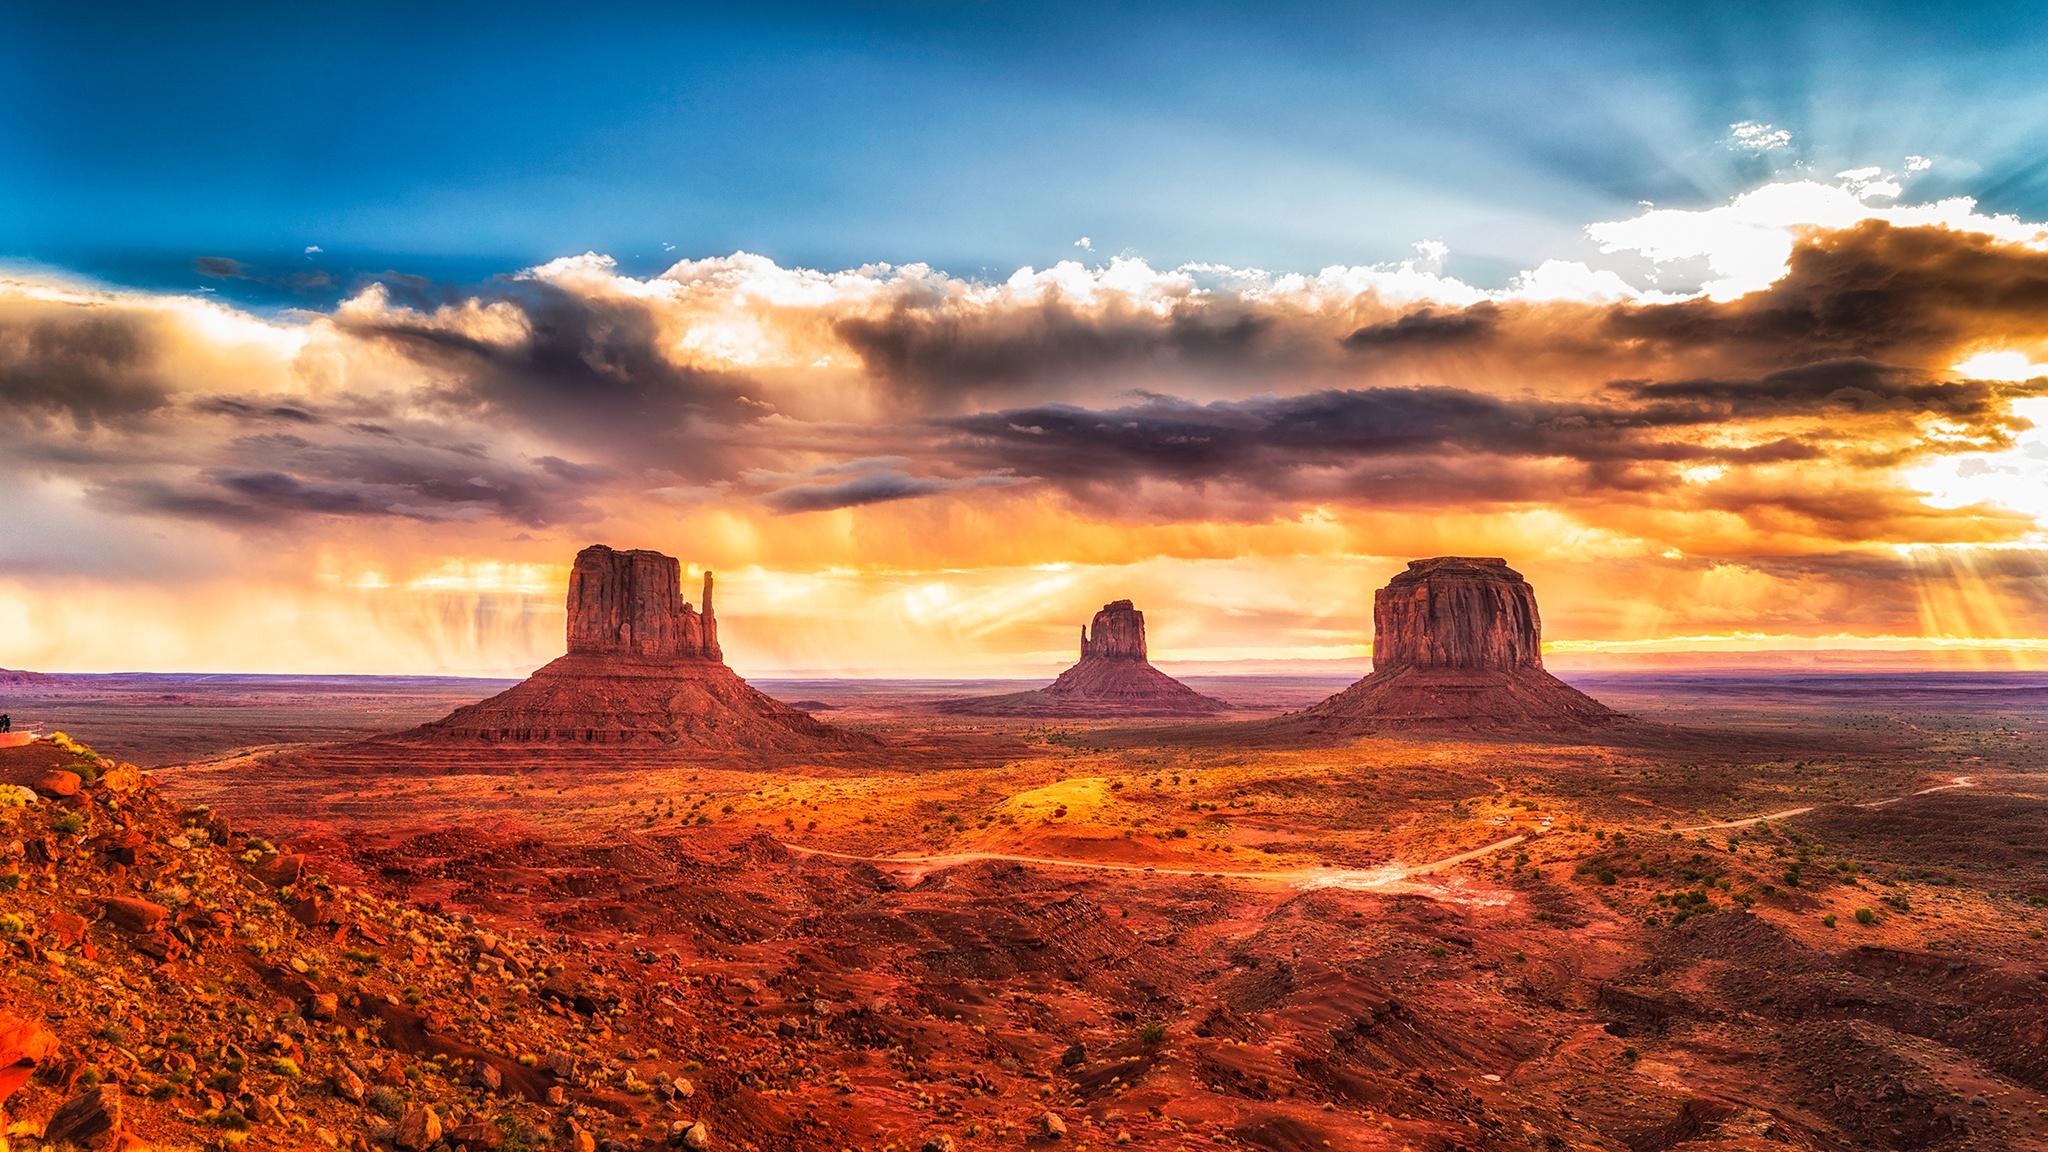 Cloud Desert Horizon Landscape Monument Valley Sky Usa 2048x1152